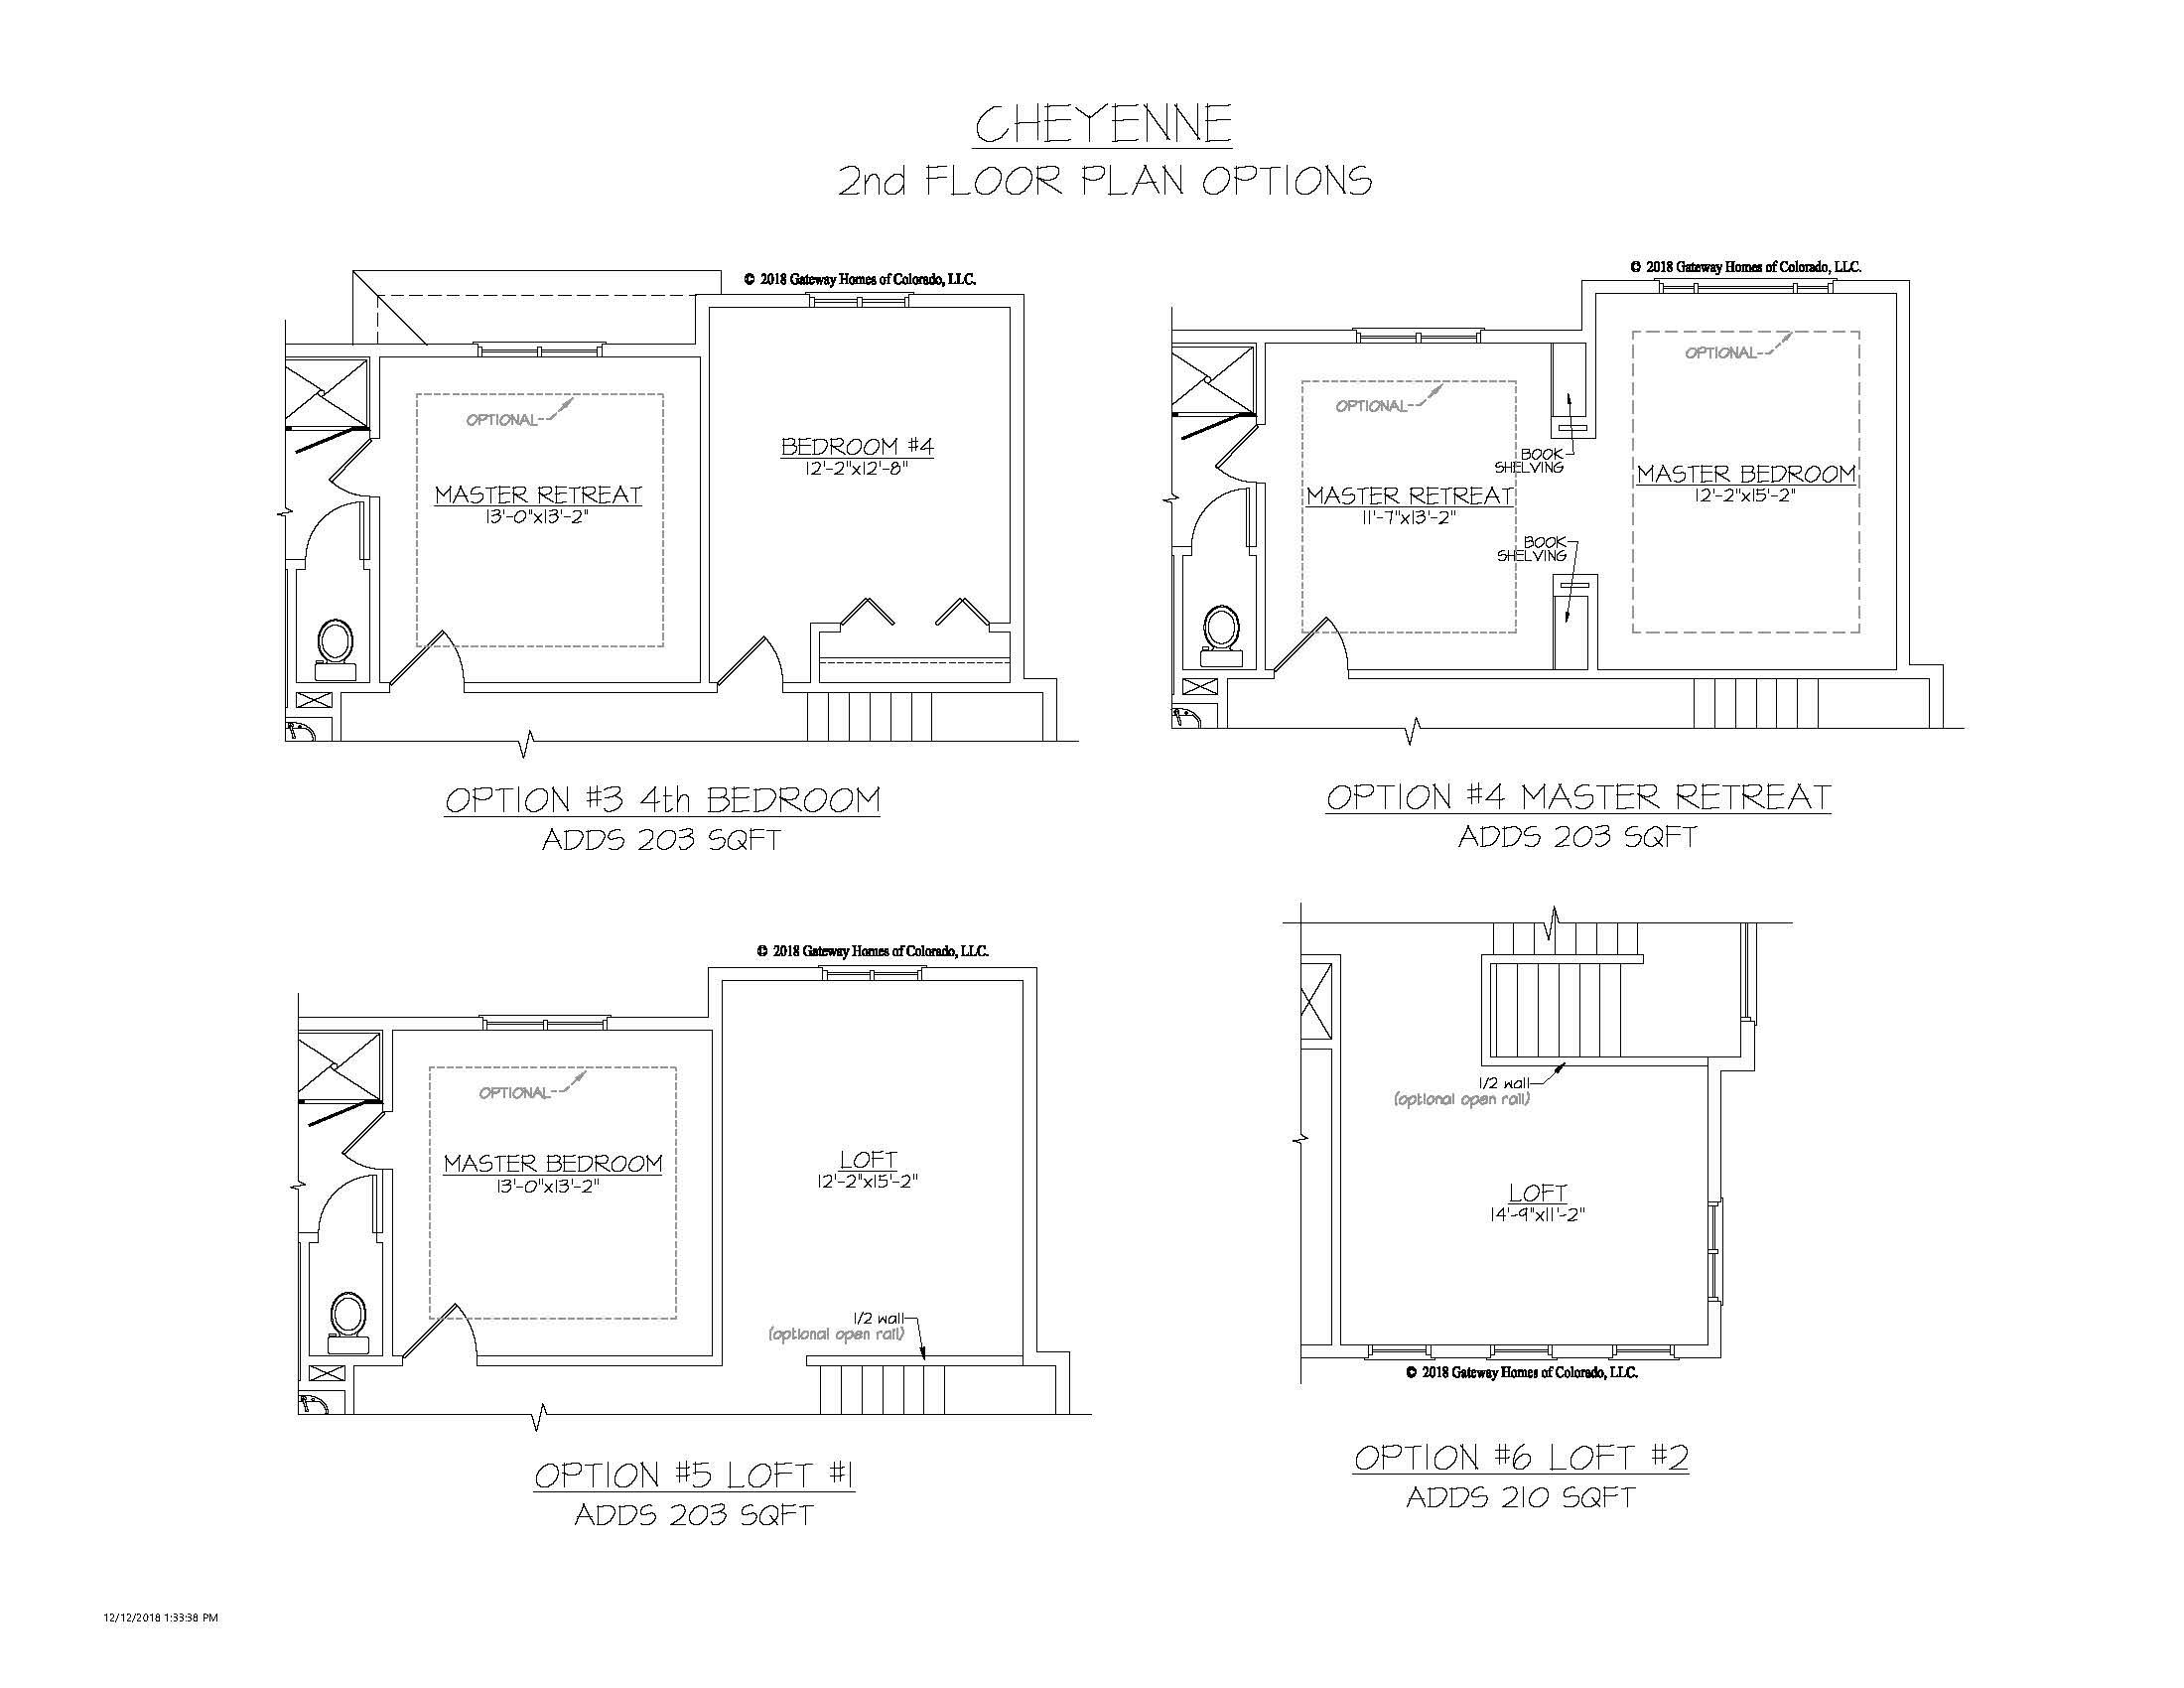 SM Cheyenne 2nd Floor Plan Options